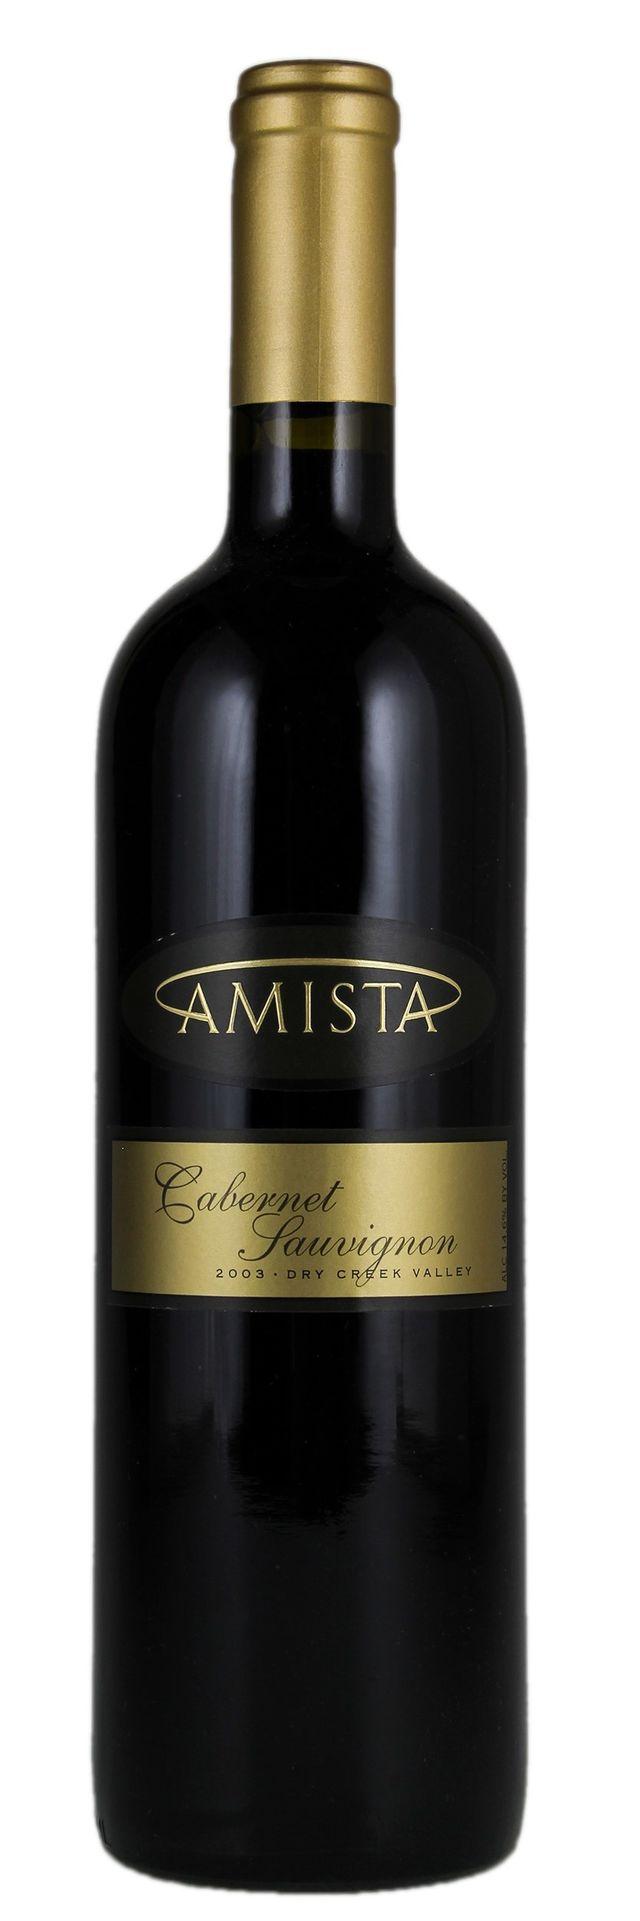 2012 Amista, Cabernet Sauvignon